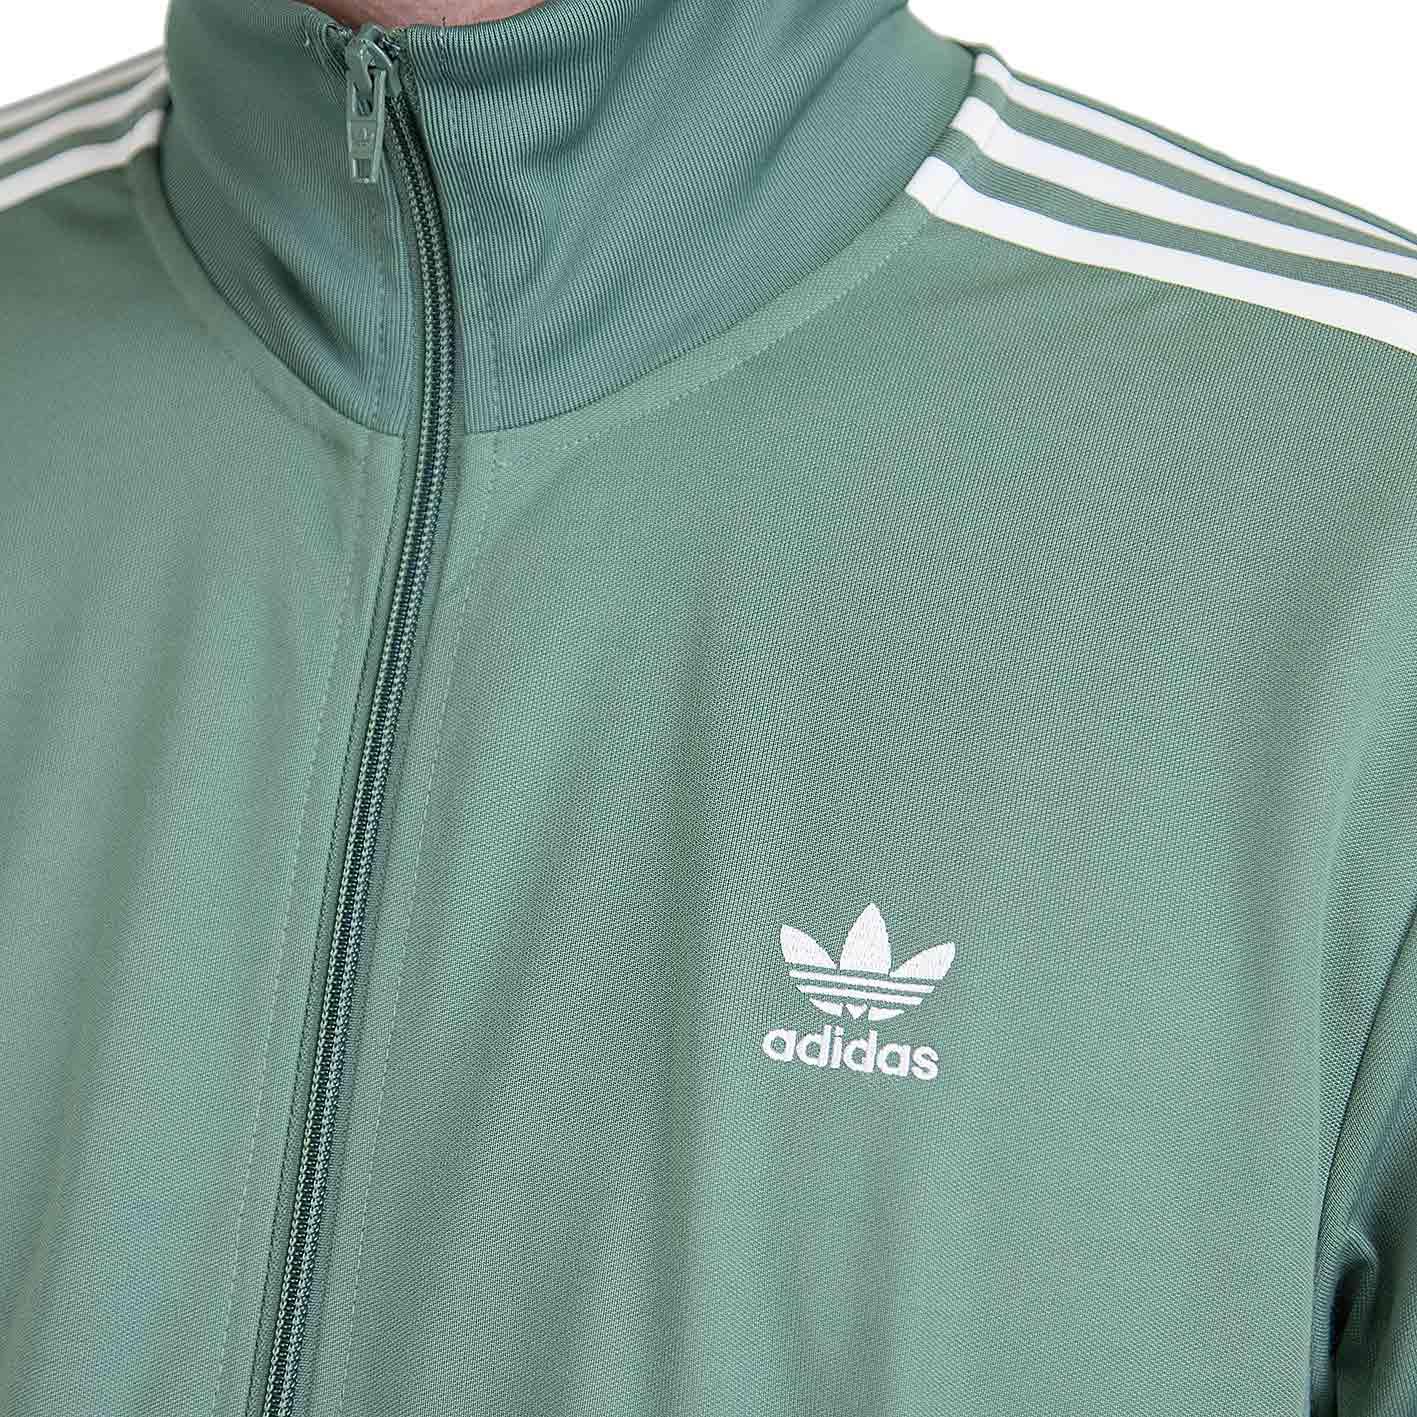 Adidas Originals Beckenbauer Trainingsjacke gruen